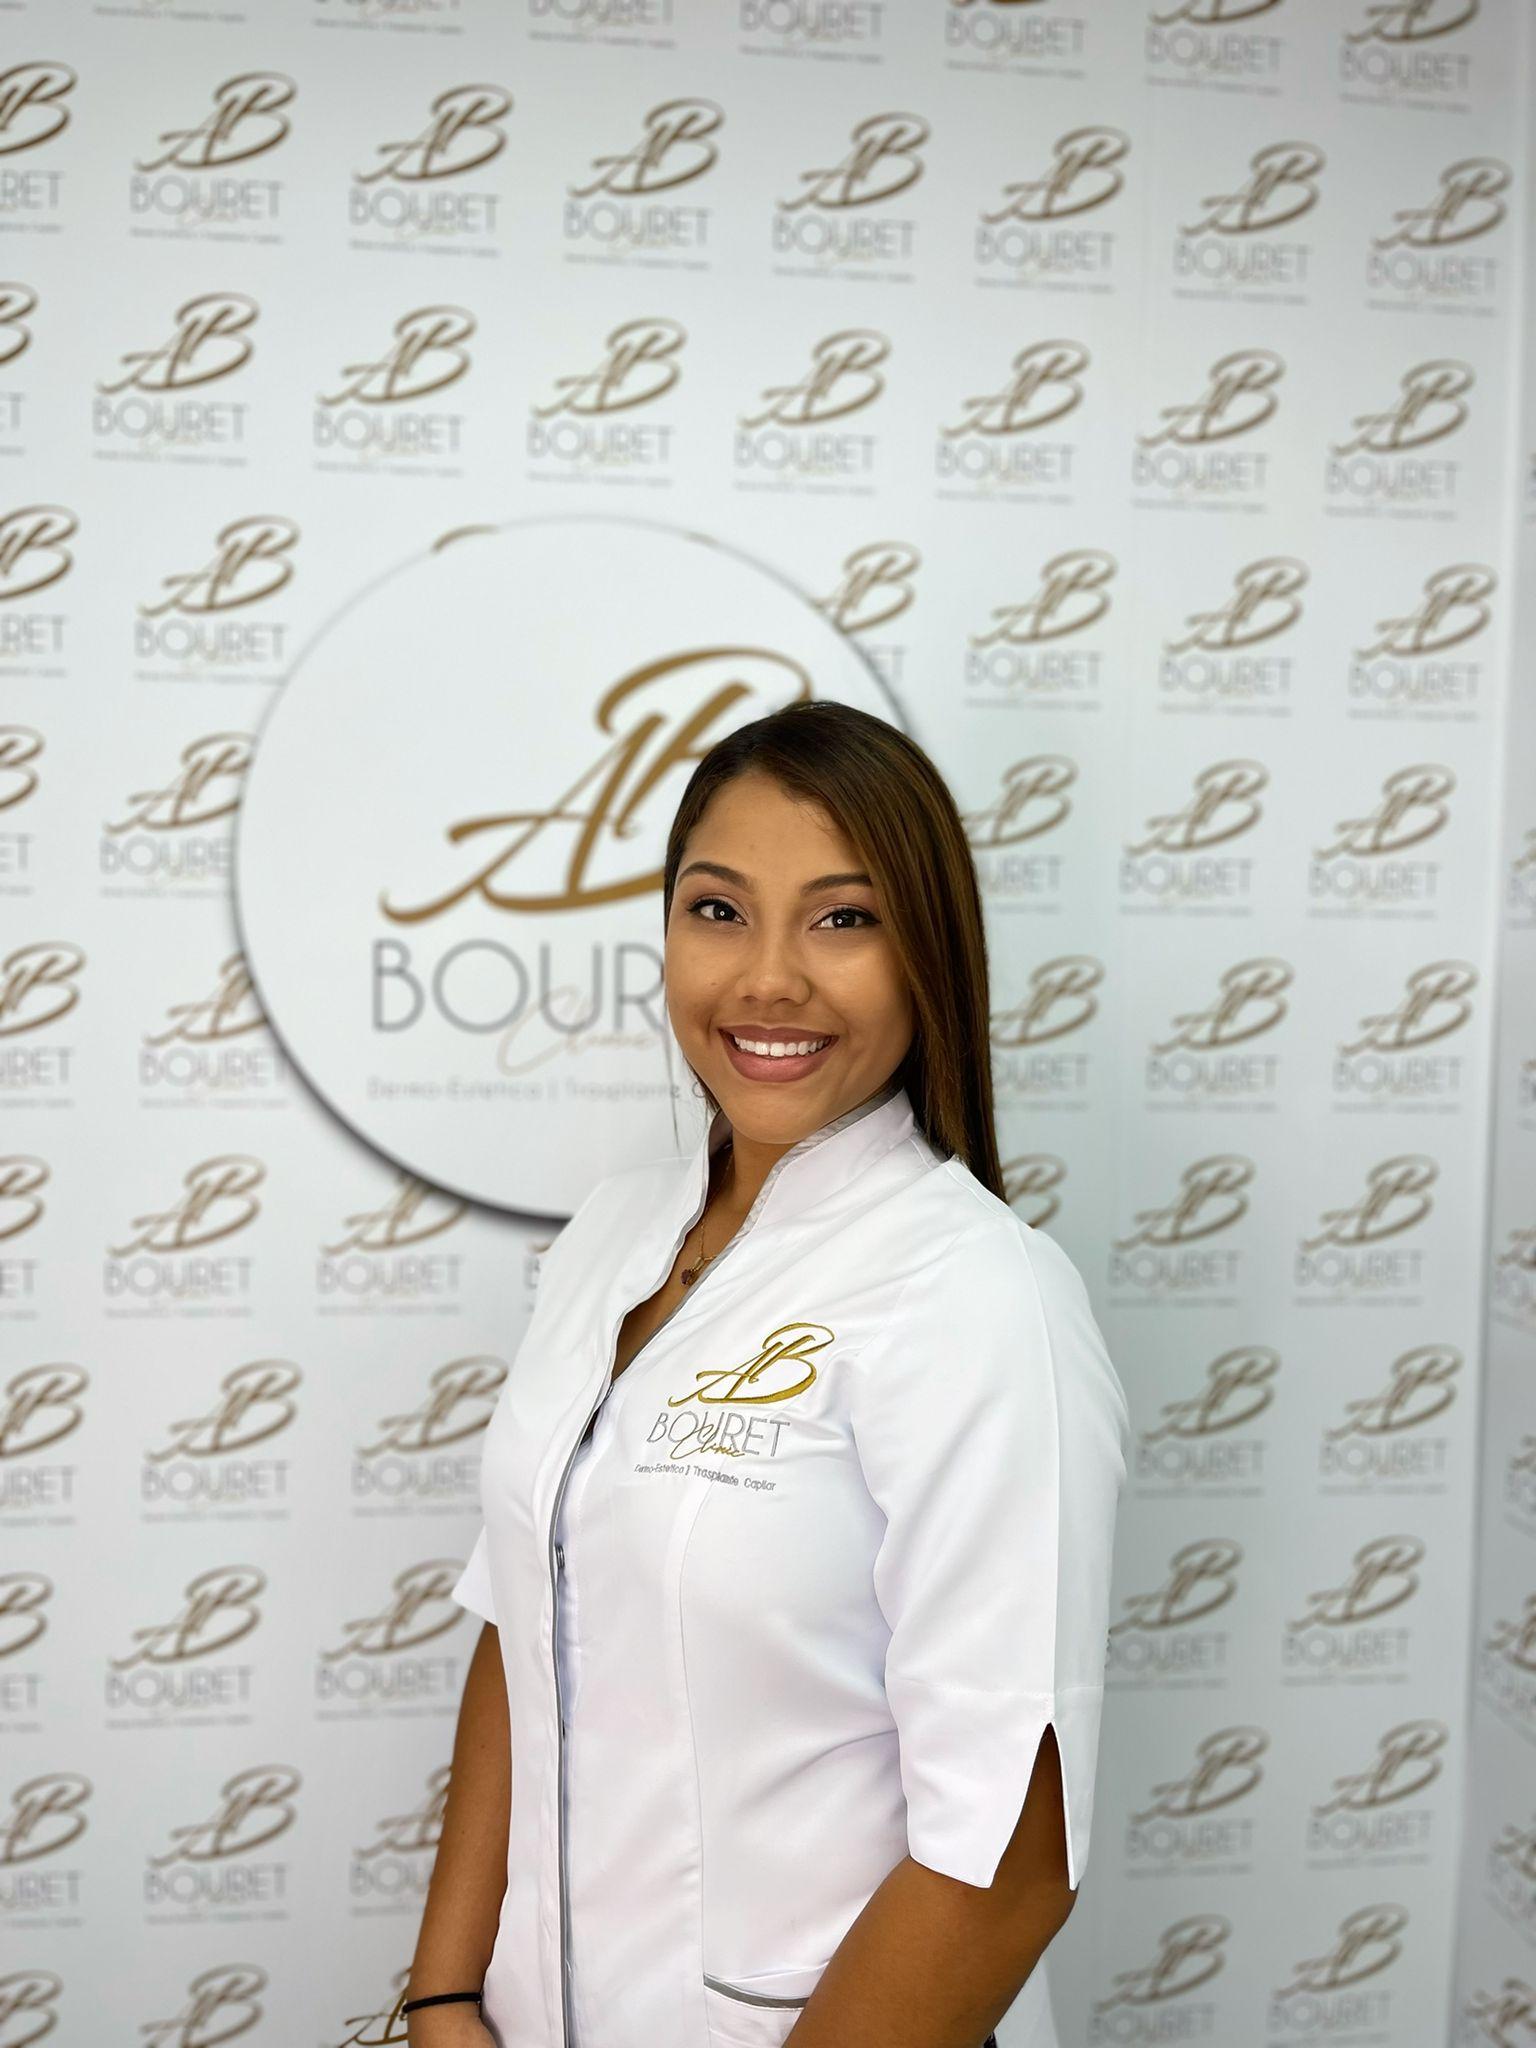 LORENA - Bouret Clinic